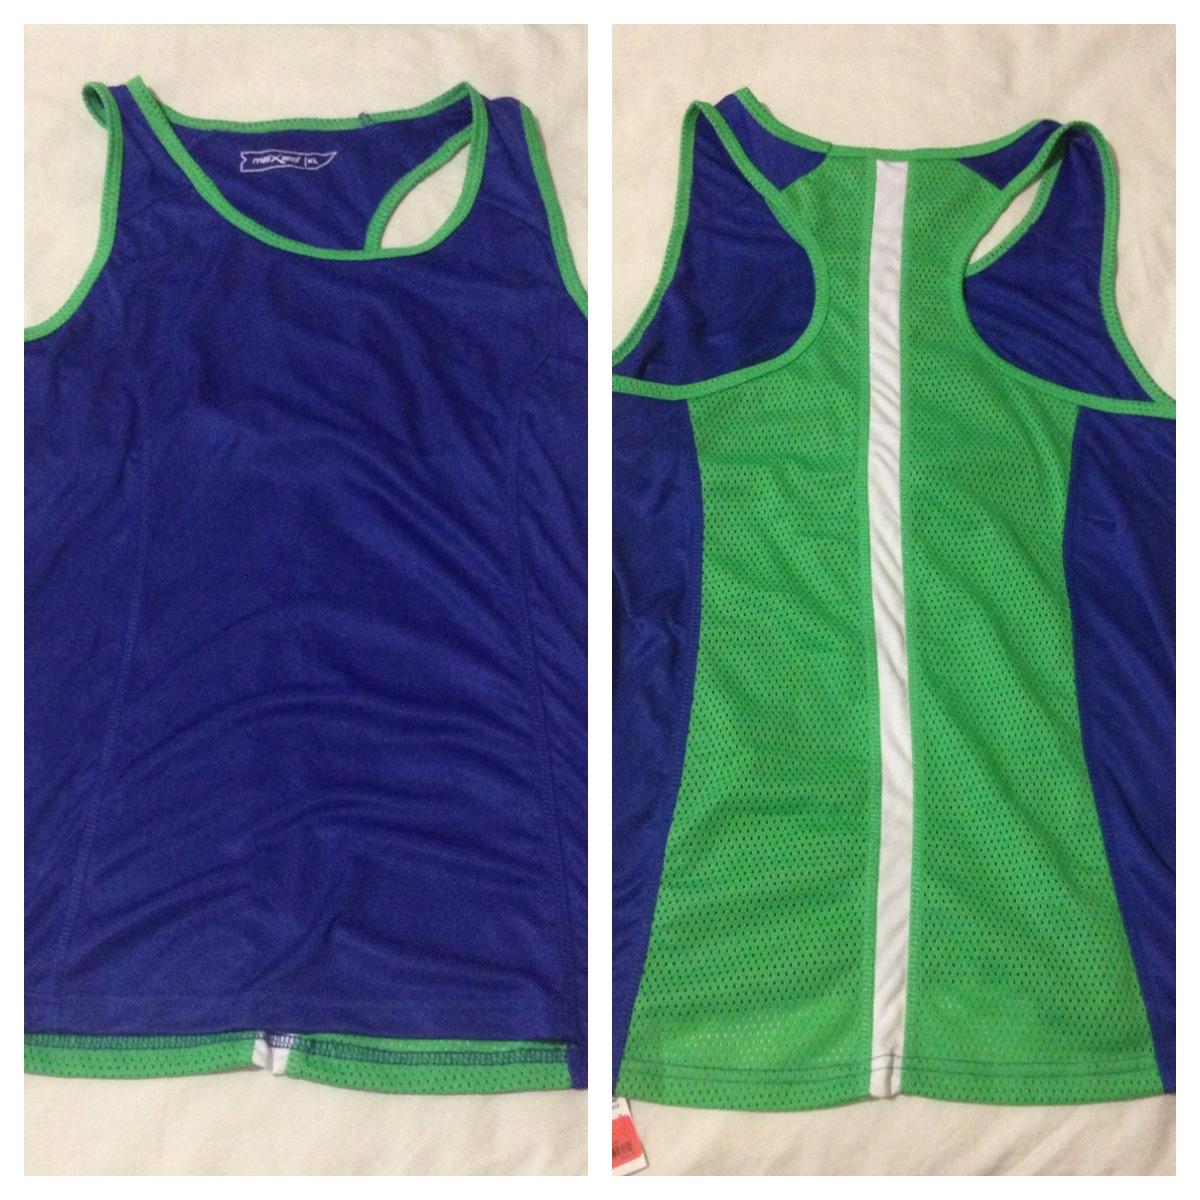 Mr Price Sport Gym Vests